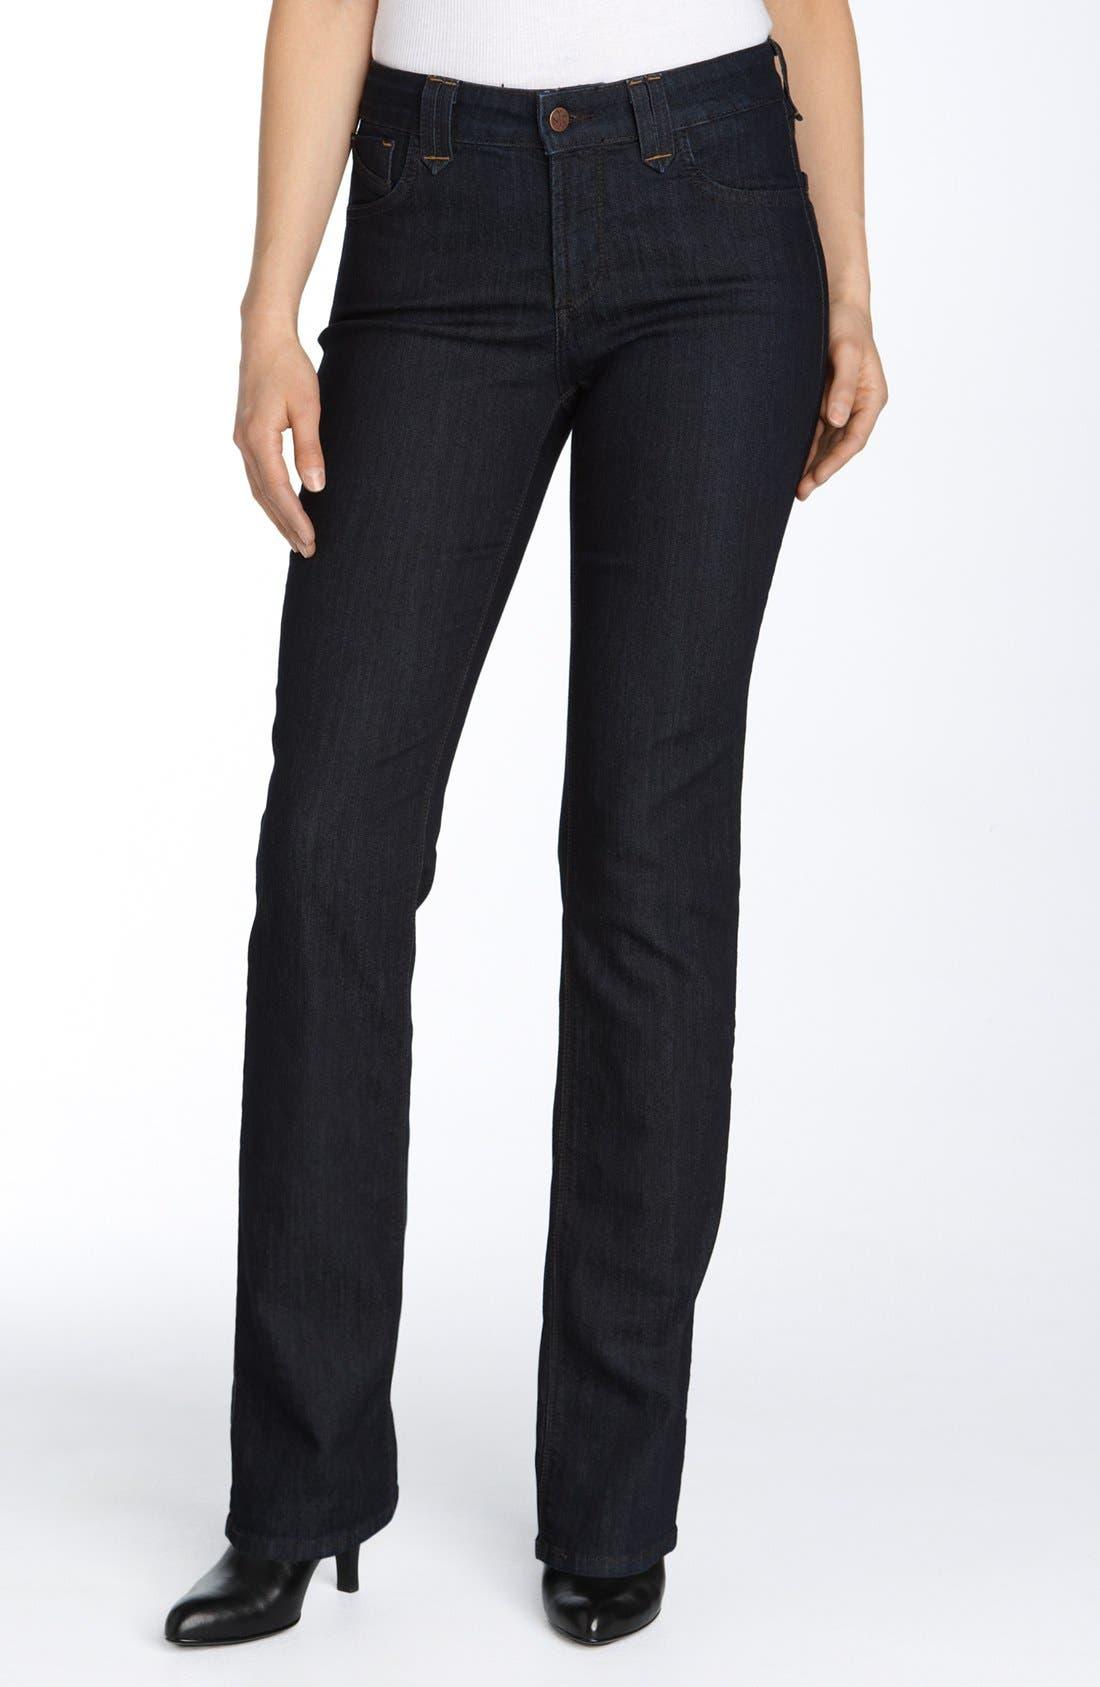 Alternate Image 1 Selected - NYDJ 'Marilyn' Stretch Straight Leg Jeans (Petite)